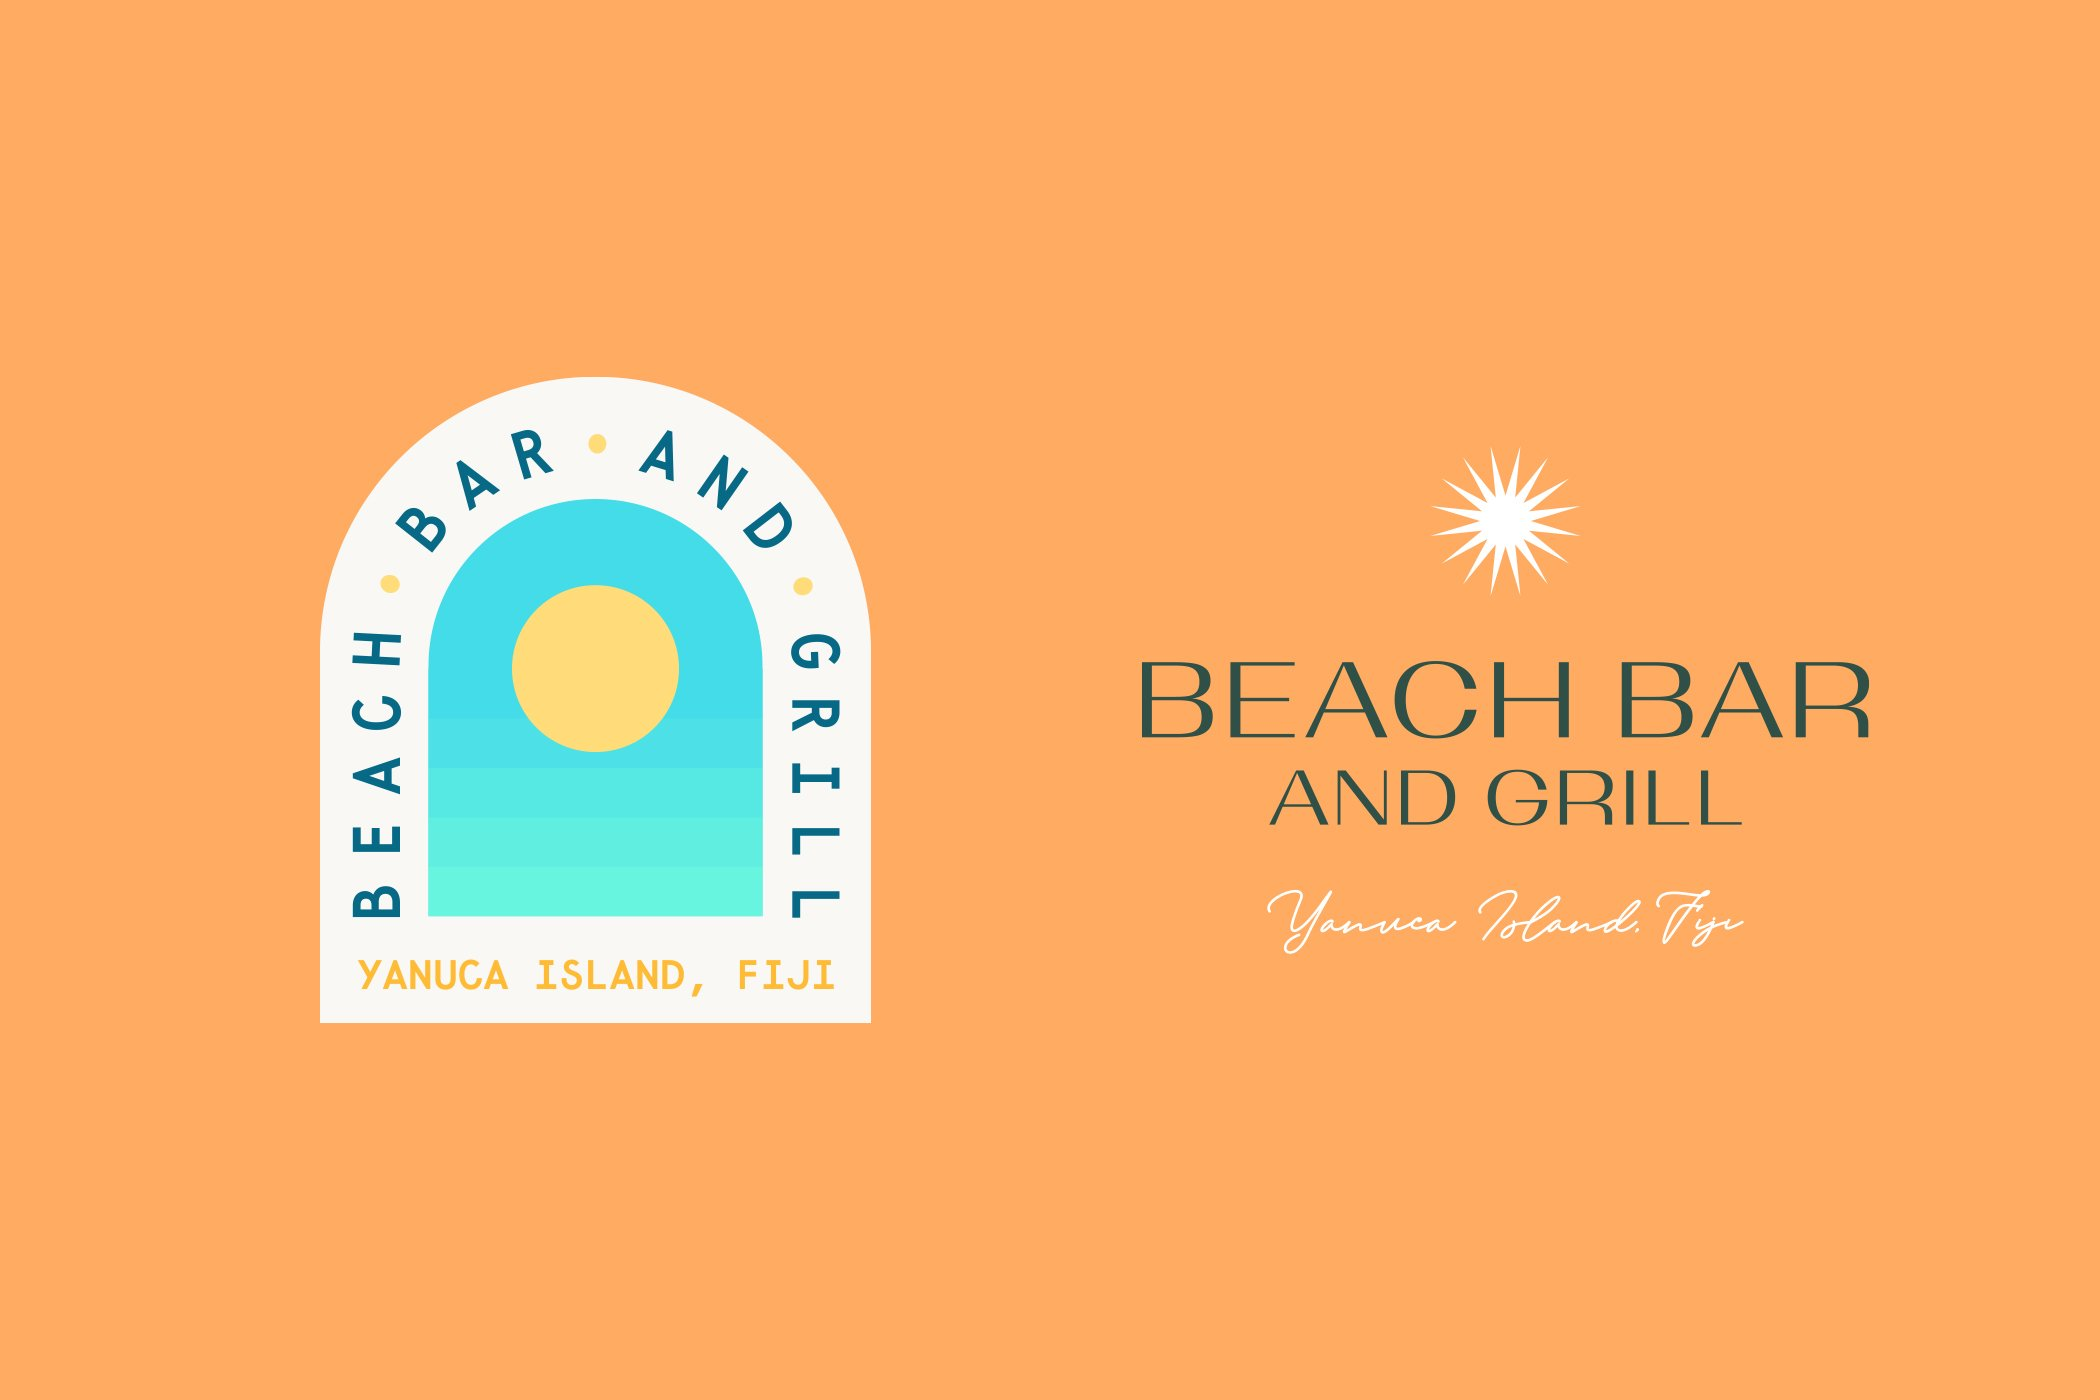 Beach Bar and Grill - Alternative Logo options